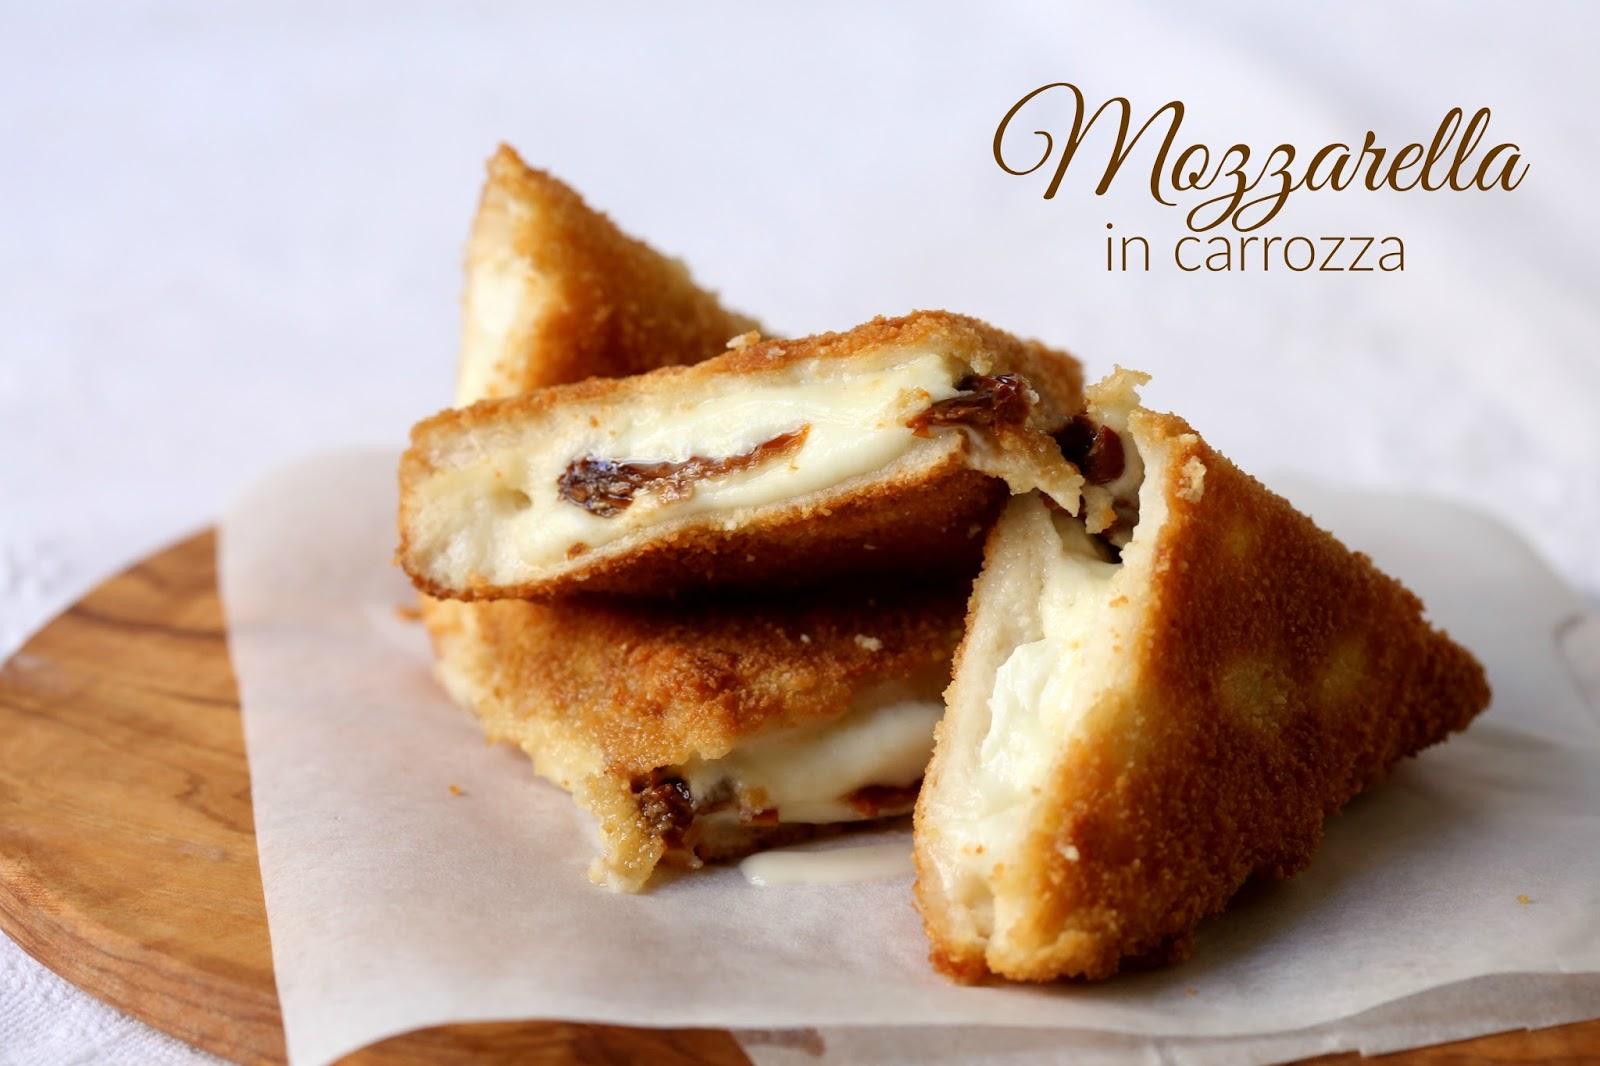 Resteverwertung auf Neapolitanisch: Mozzarella in carrozza